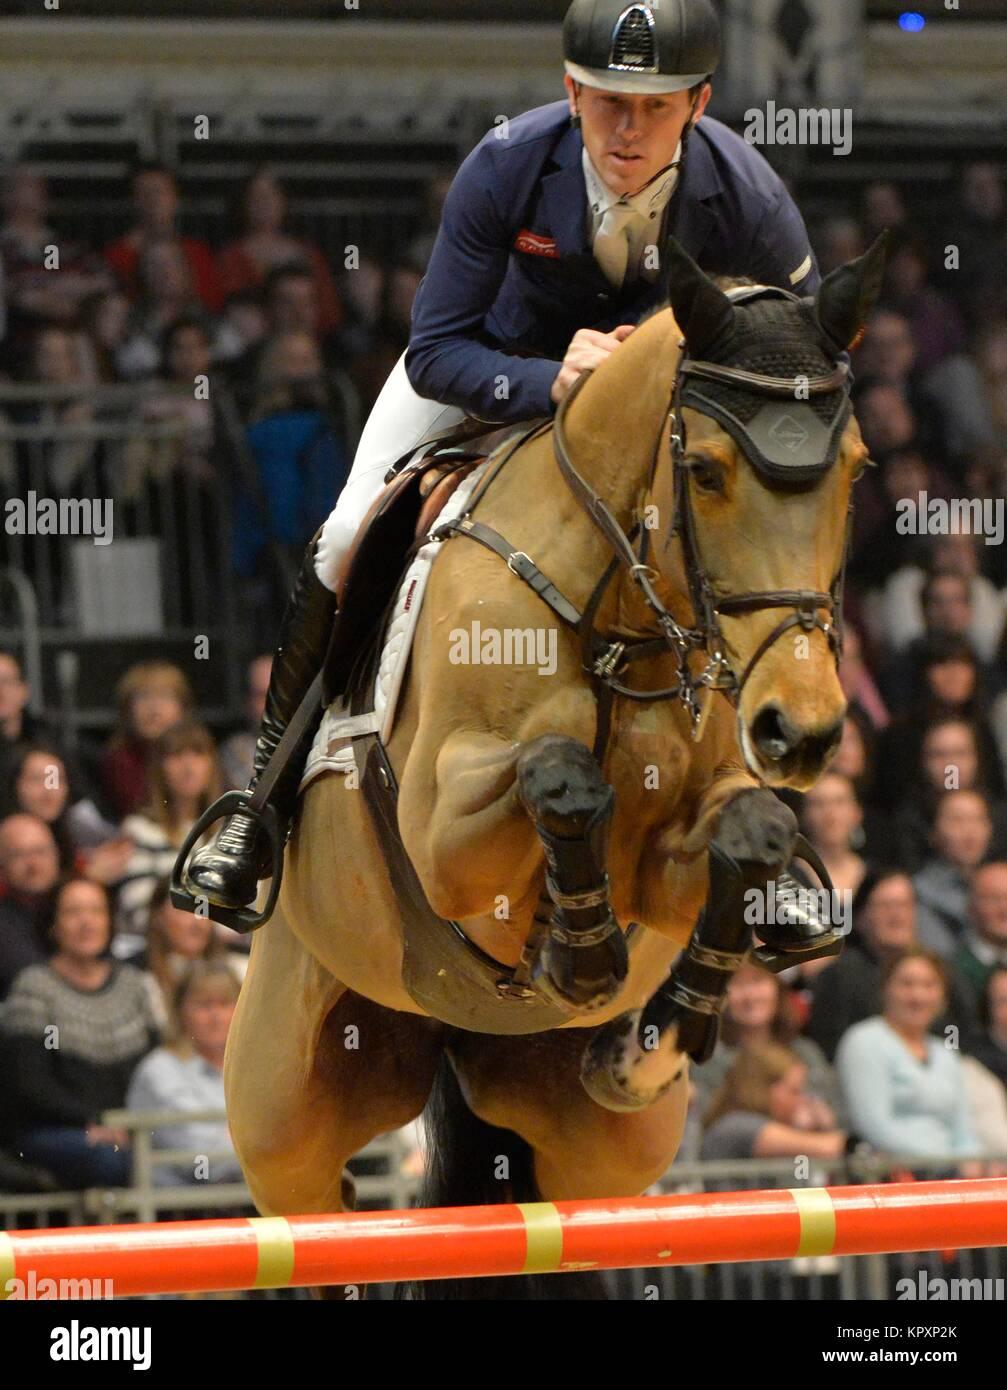 London, UK. 17th Dec, 2017.  London Olympia International Horse Show The Longines FEI World Cup London Scott Brash Stock Photo